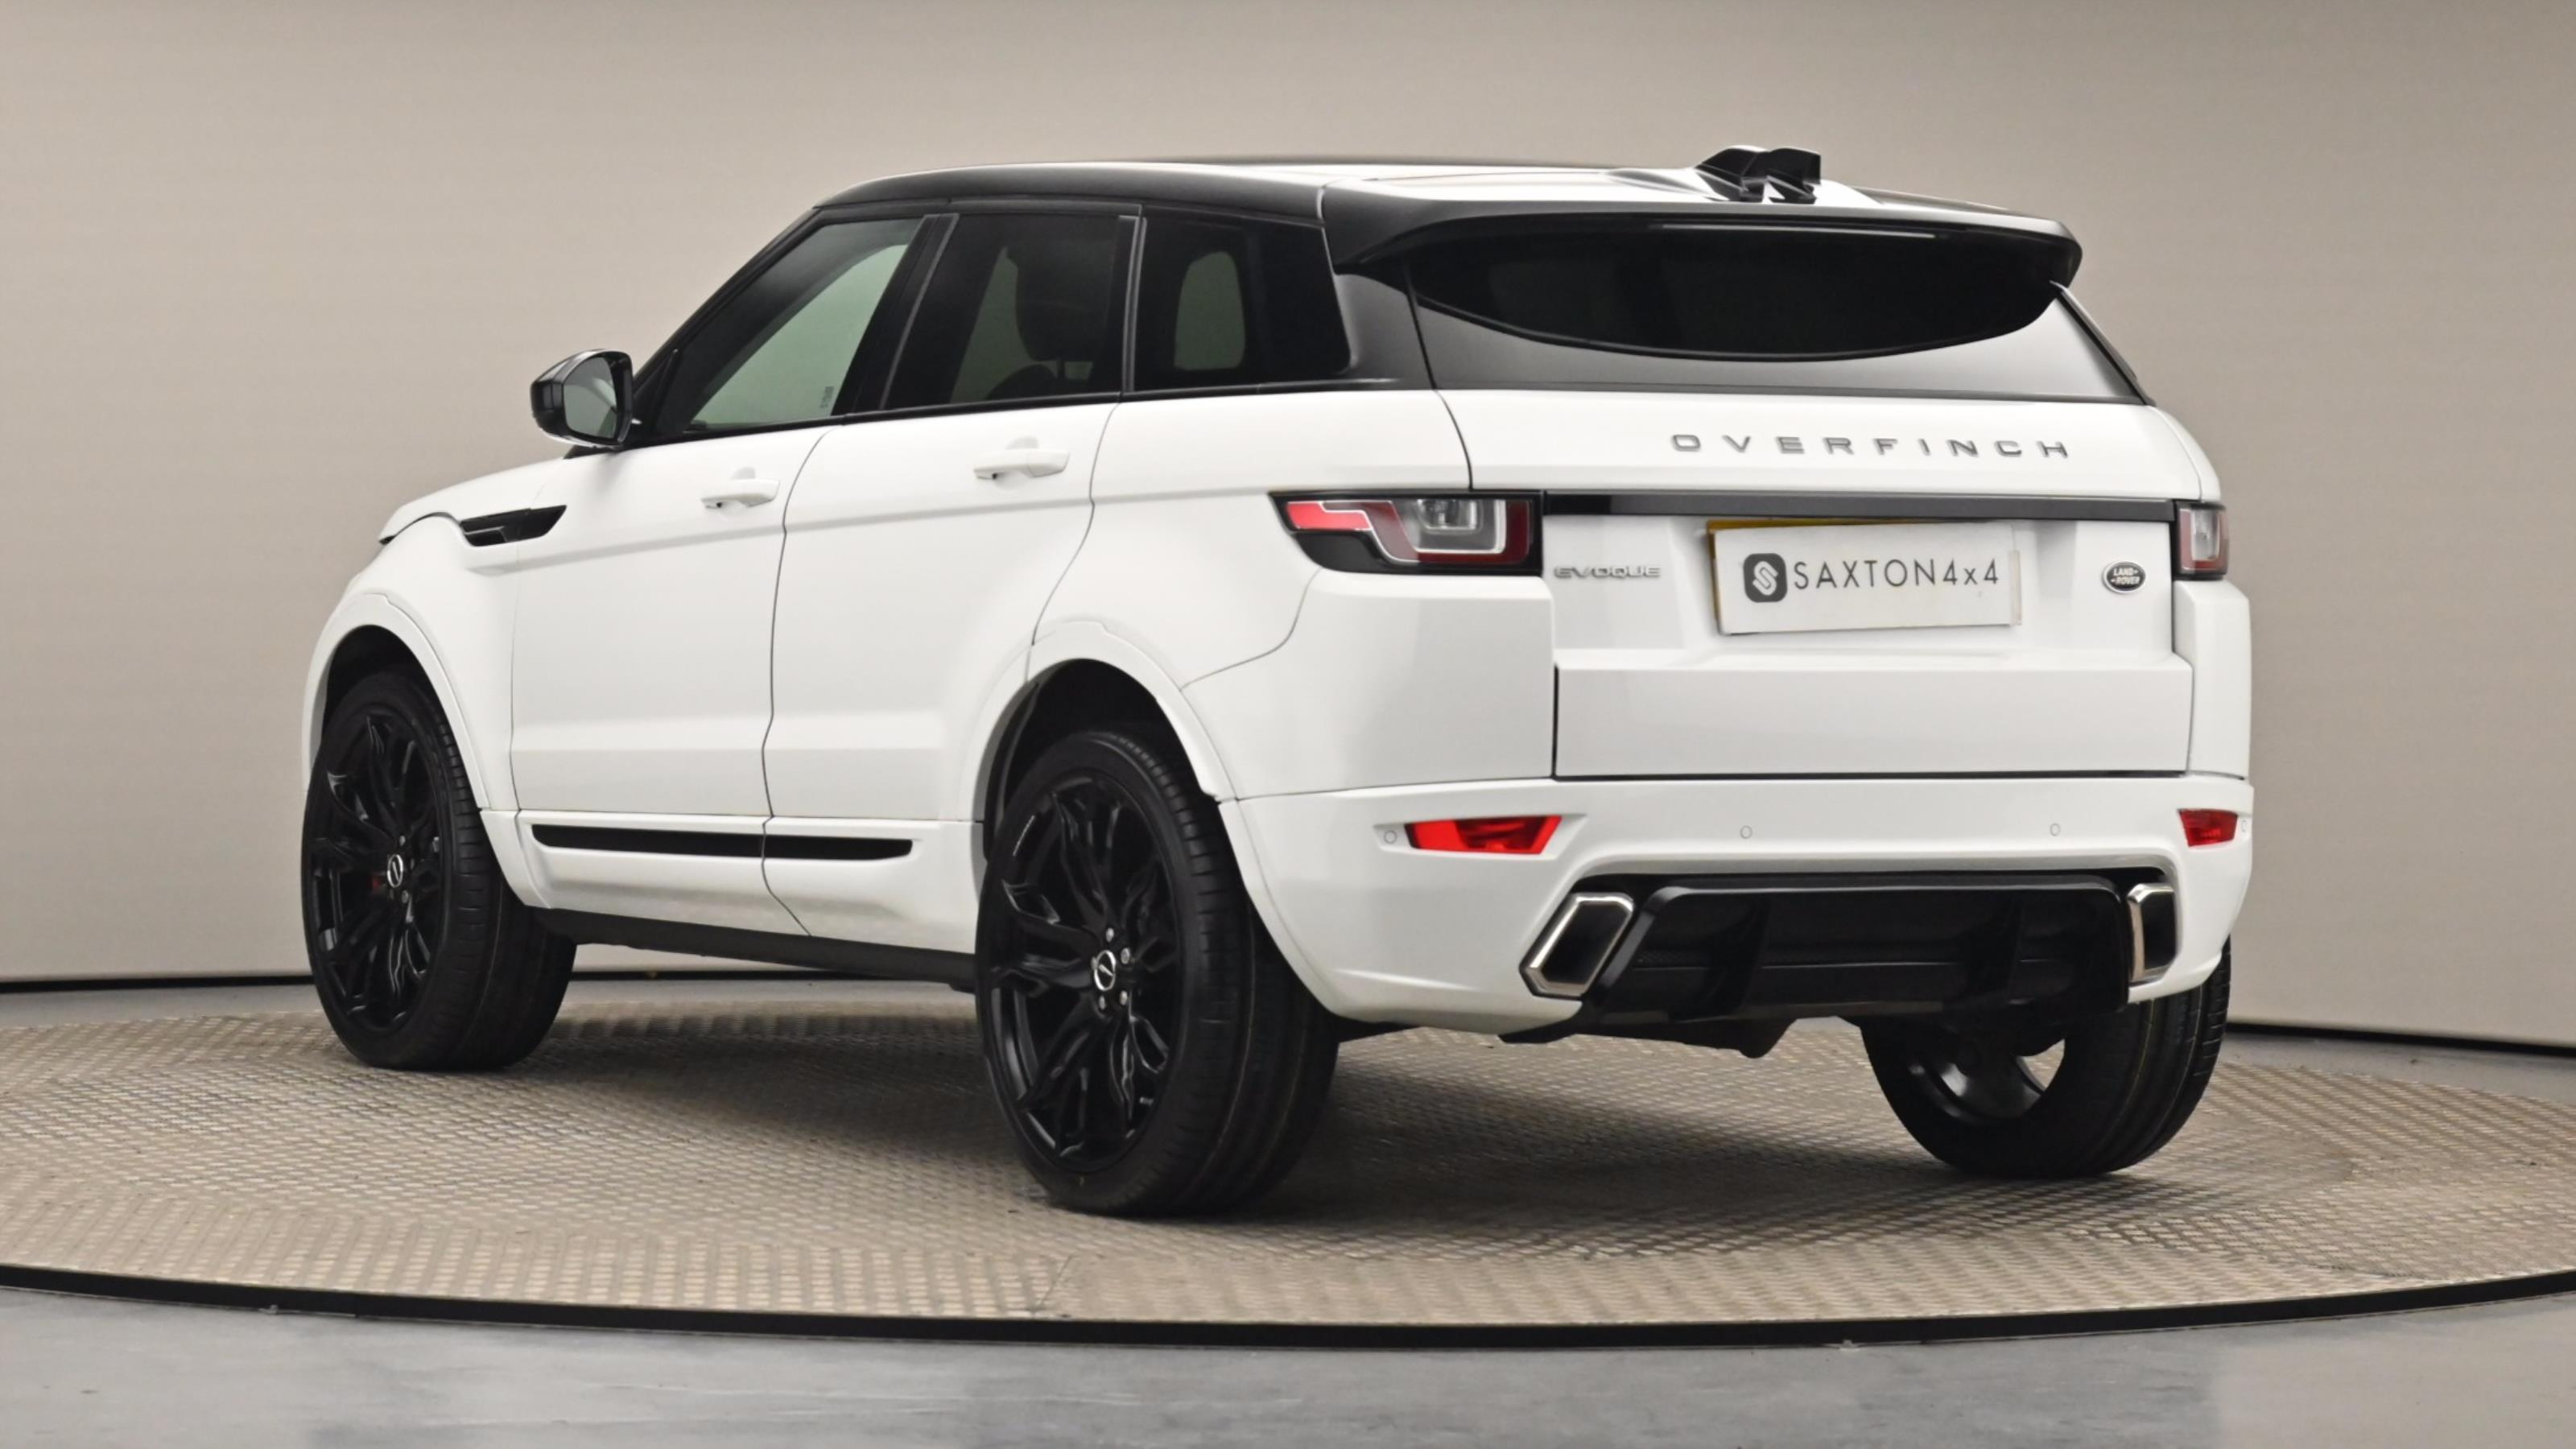 Used 2016 Land Rover RANGE ROVER EVOQUE 2.0 TD4 SE Tech 5dr Auto WHITE at Saxton4x4